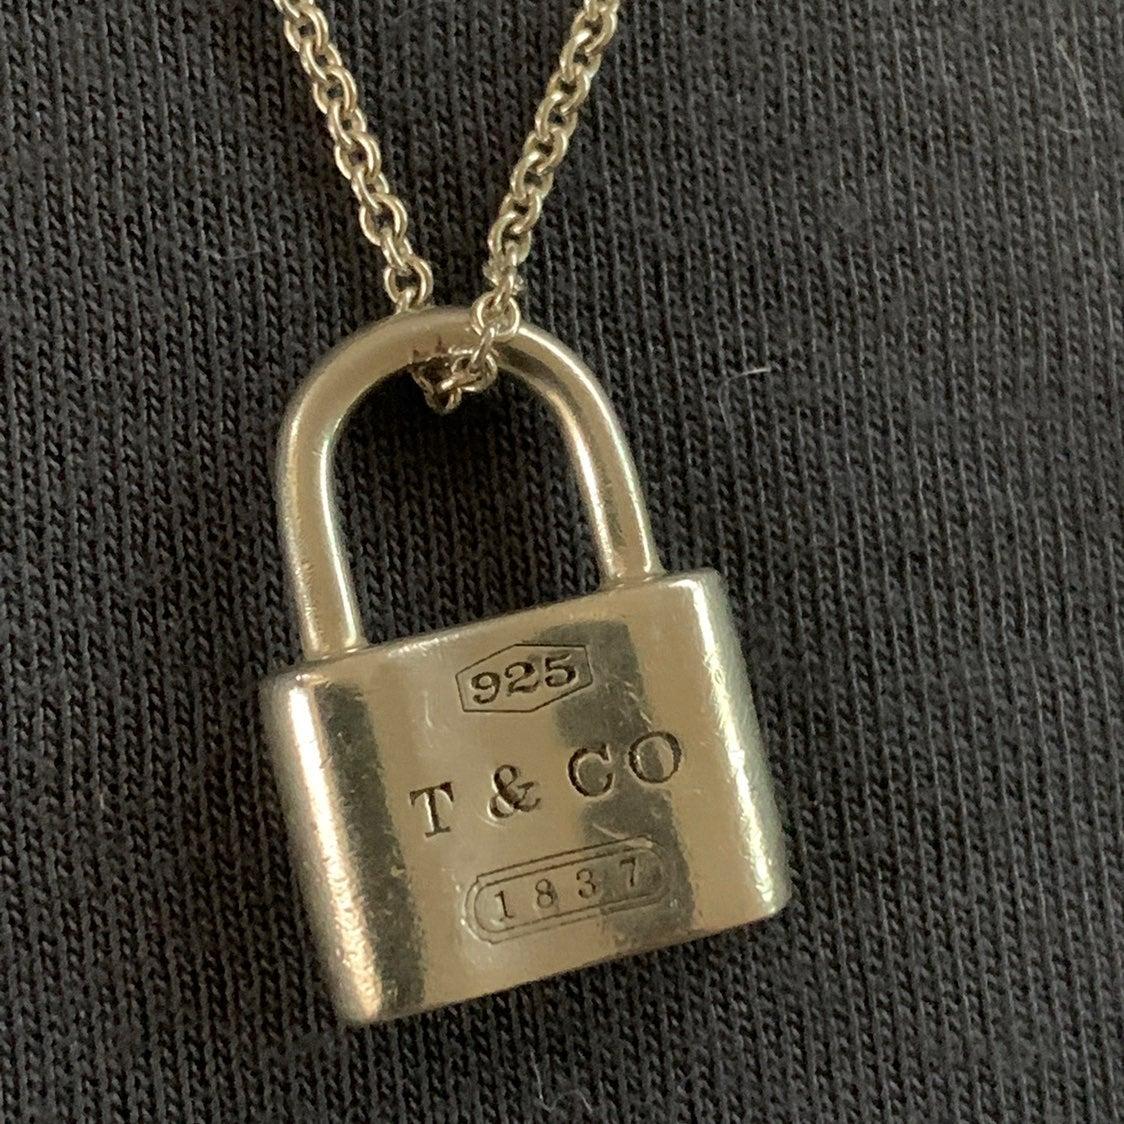 Tiffany & Co. Lock Pendant Necklace